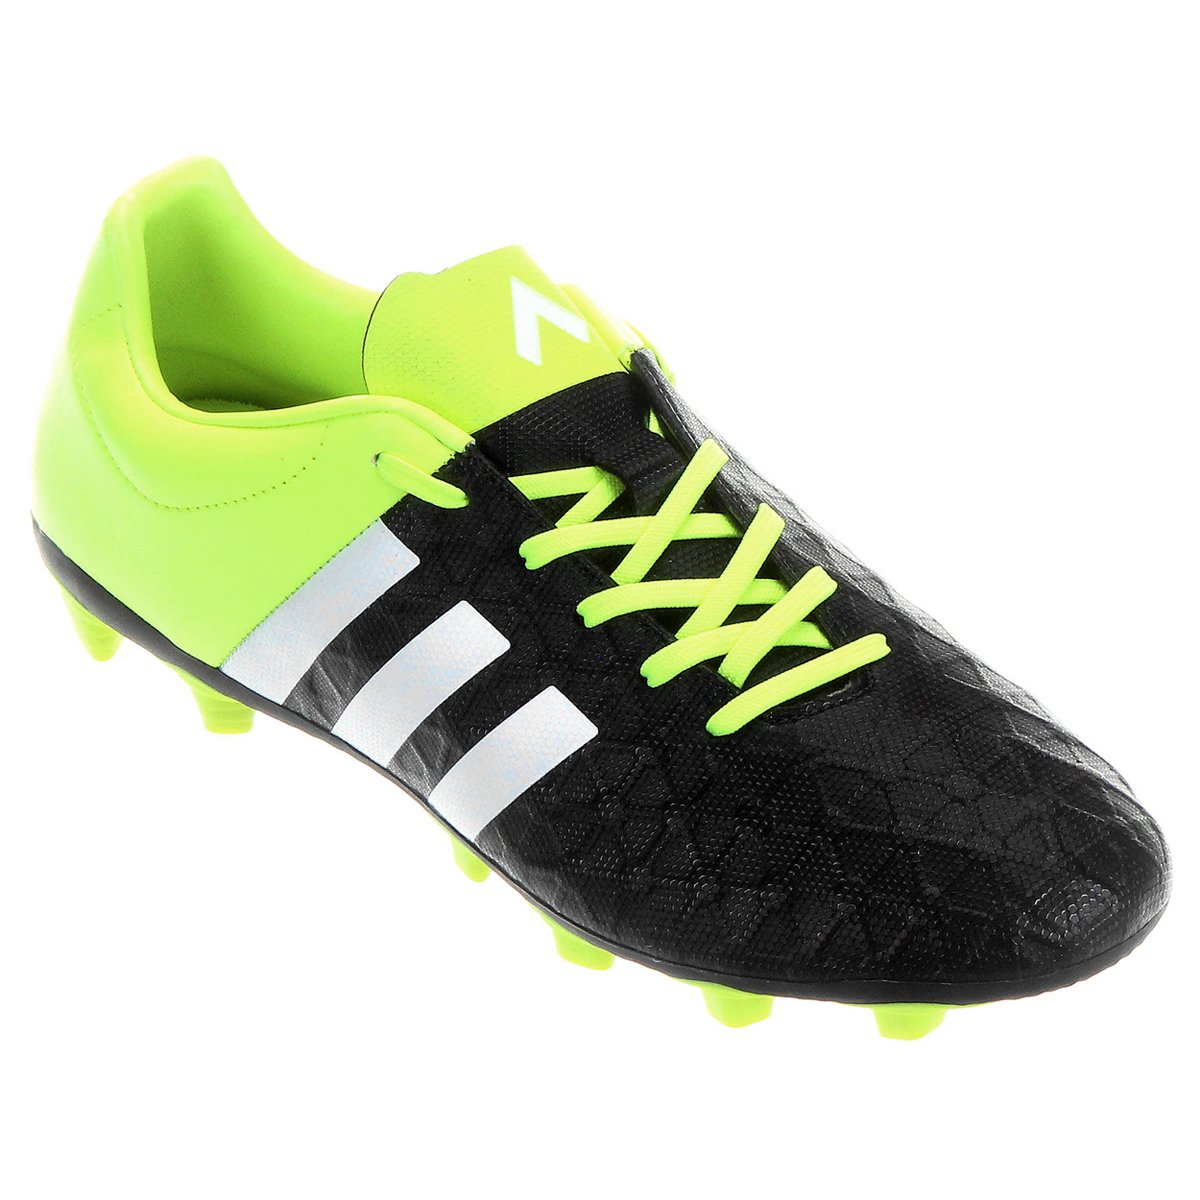 6260fbb773 Chuteira Adidas Ace 15.4 FG Campo - Compre Agora